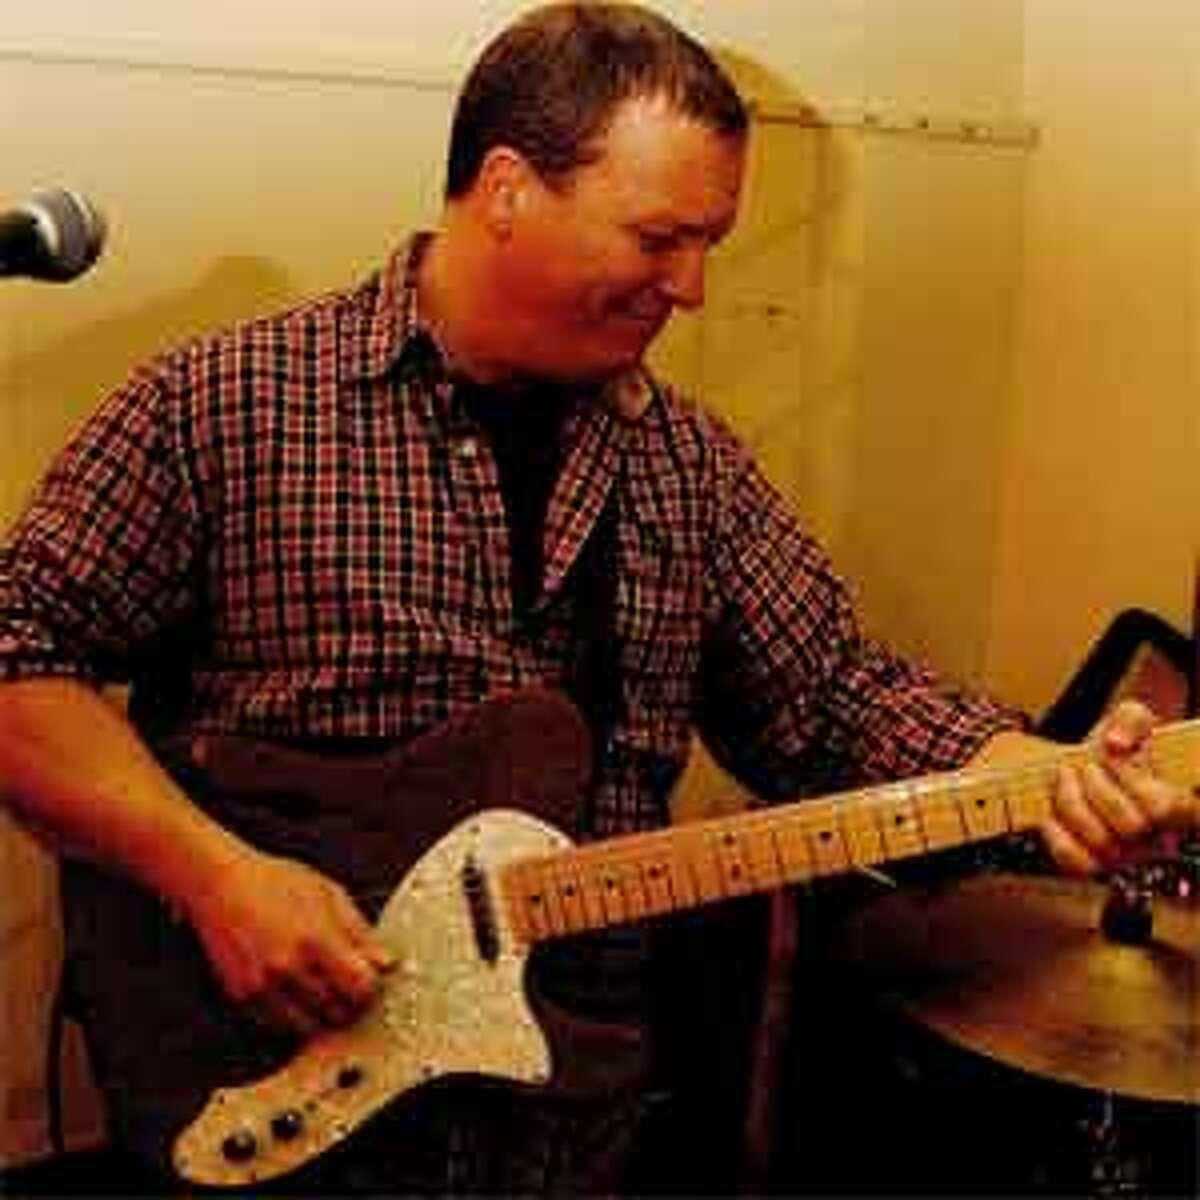 Musician Casey Gorman